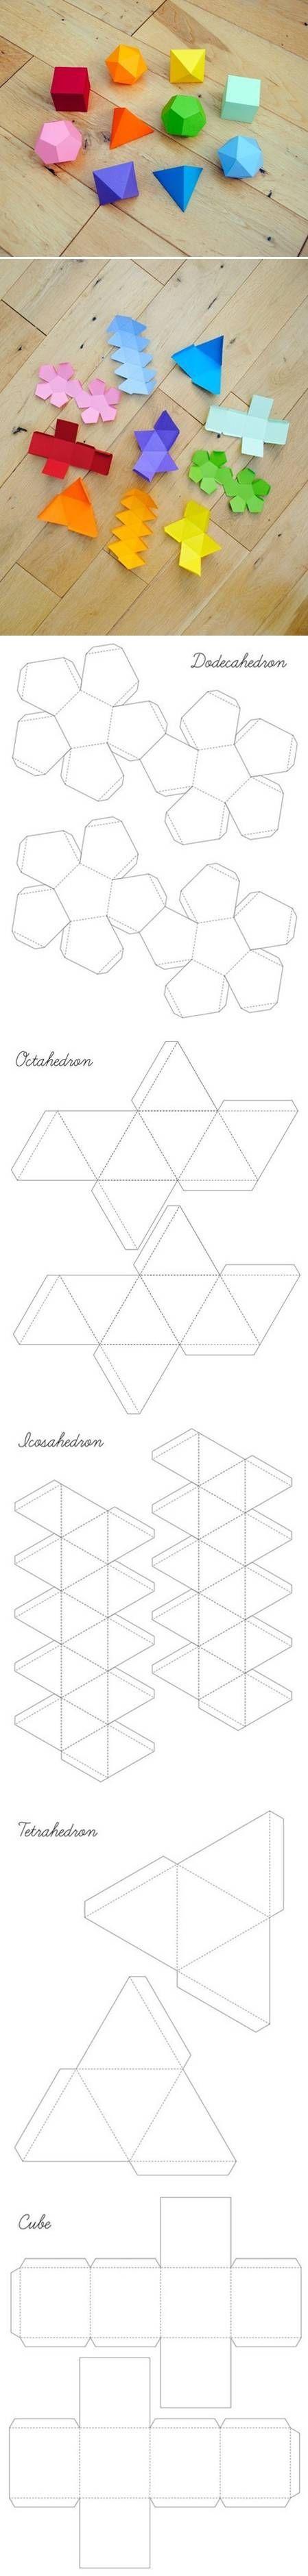 DIY Geometrical Box Templates DIY Geometrical Box Templates by diyforever